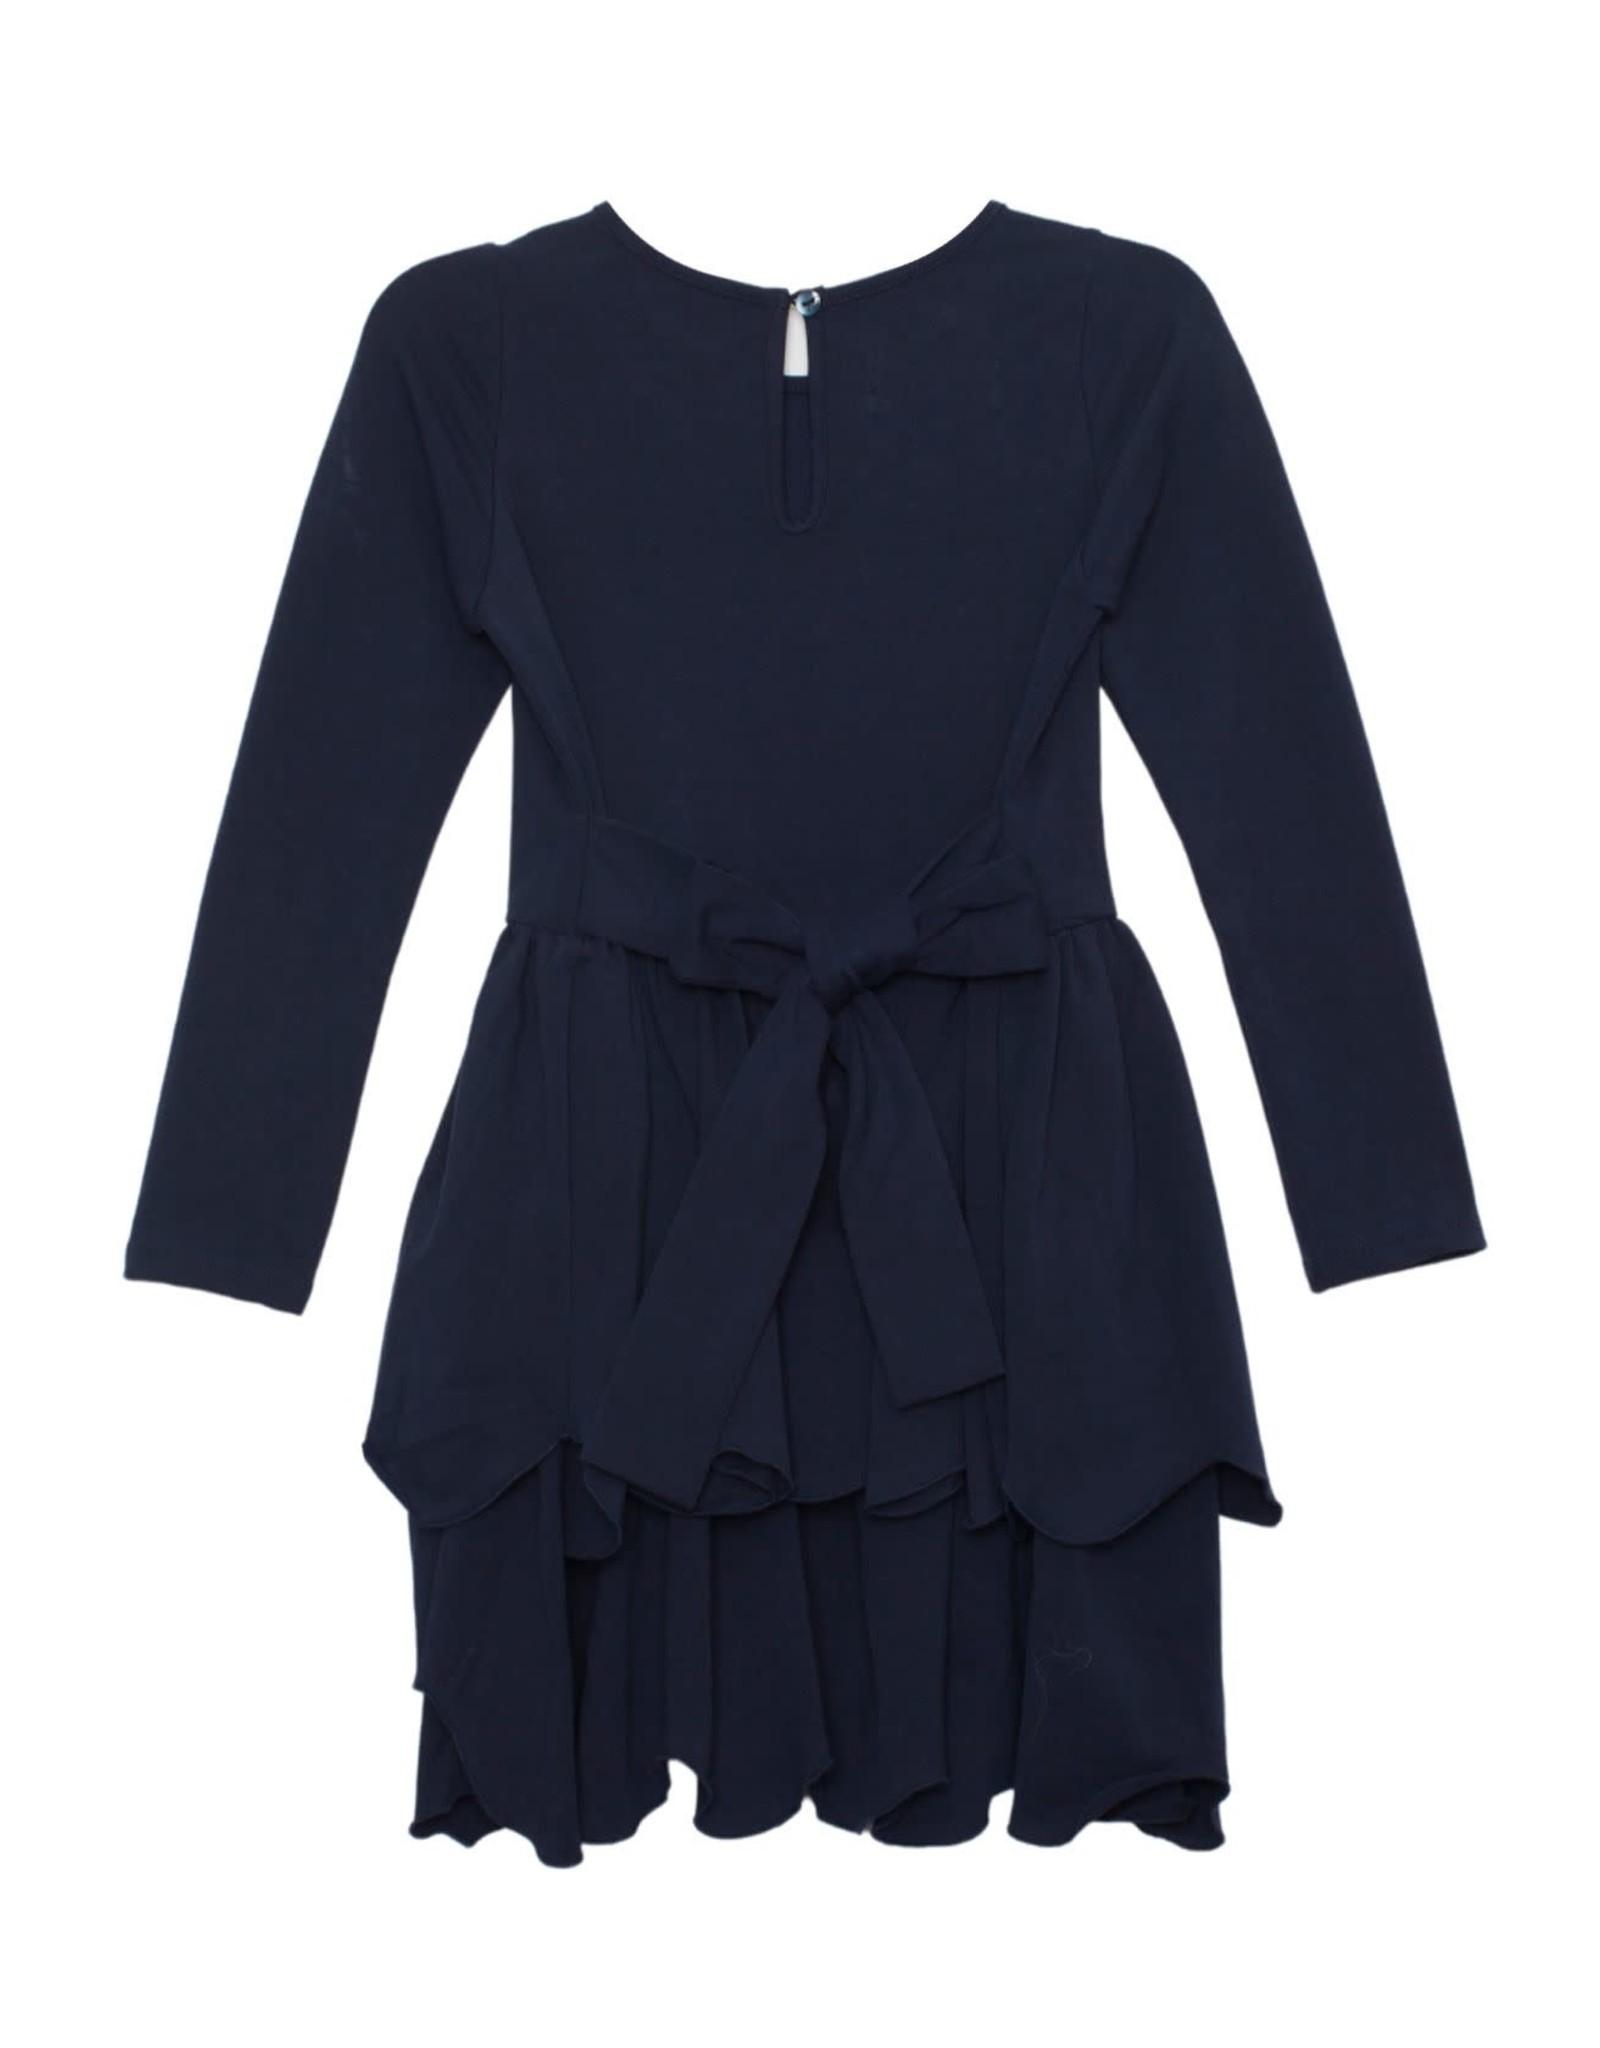 Mabel & Honey Mabel & Honey- Navy Knit LS Dress